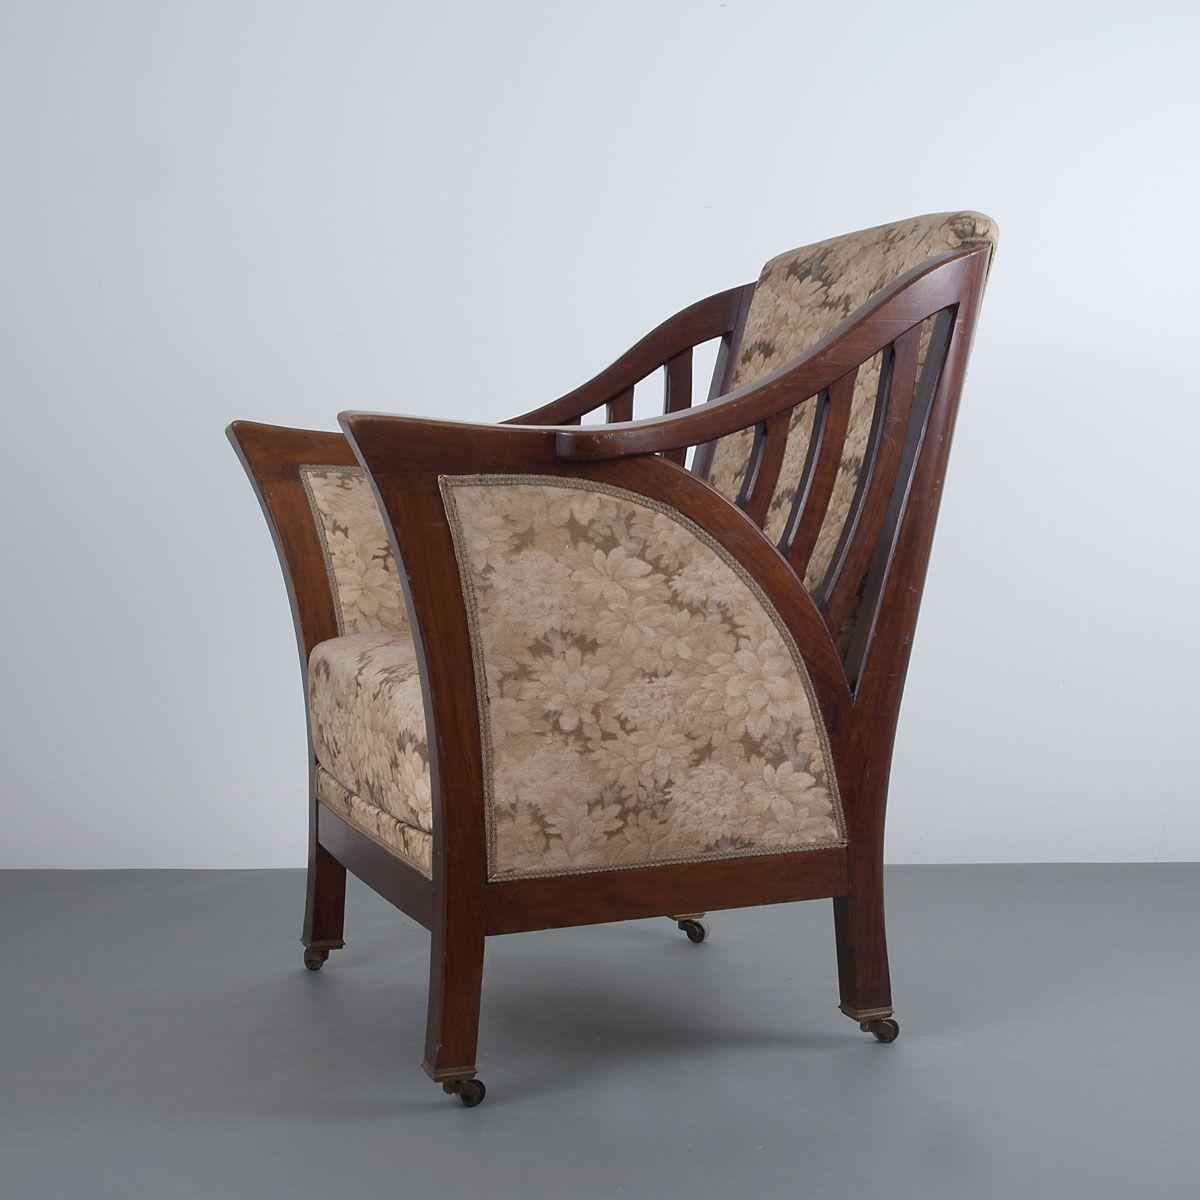 39 havana 39 easy chair henry van de velde google doodles for Sofa jugendstil